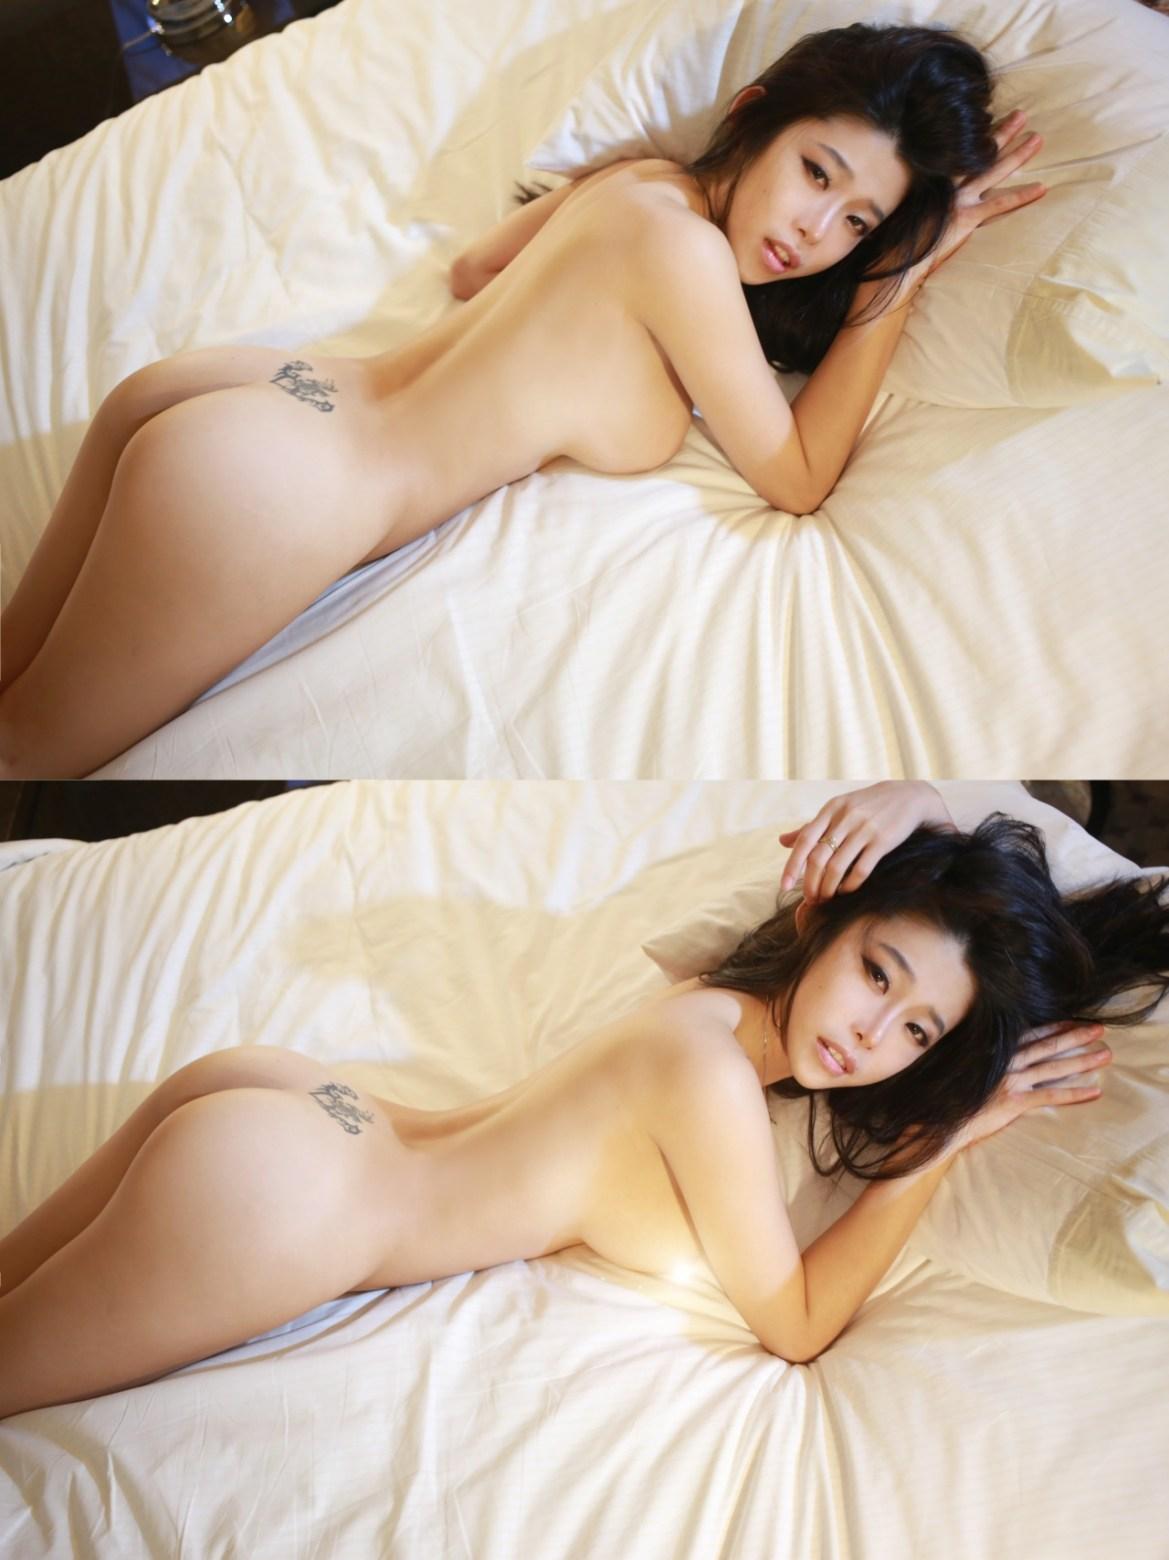 Luvian Ben Neng 本能 Nude / Naked Images 7